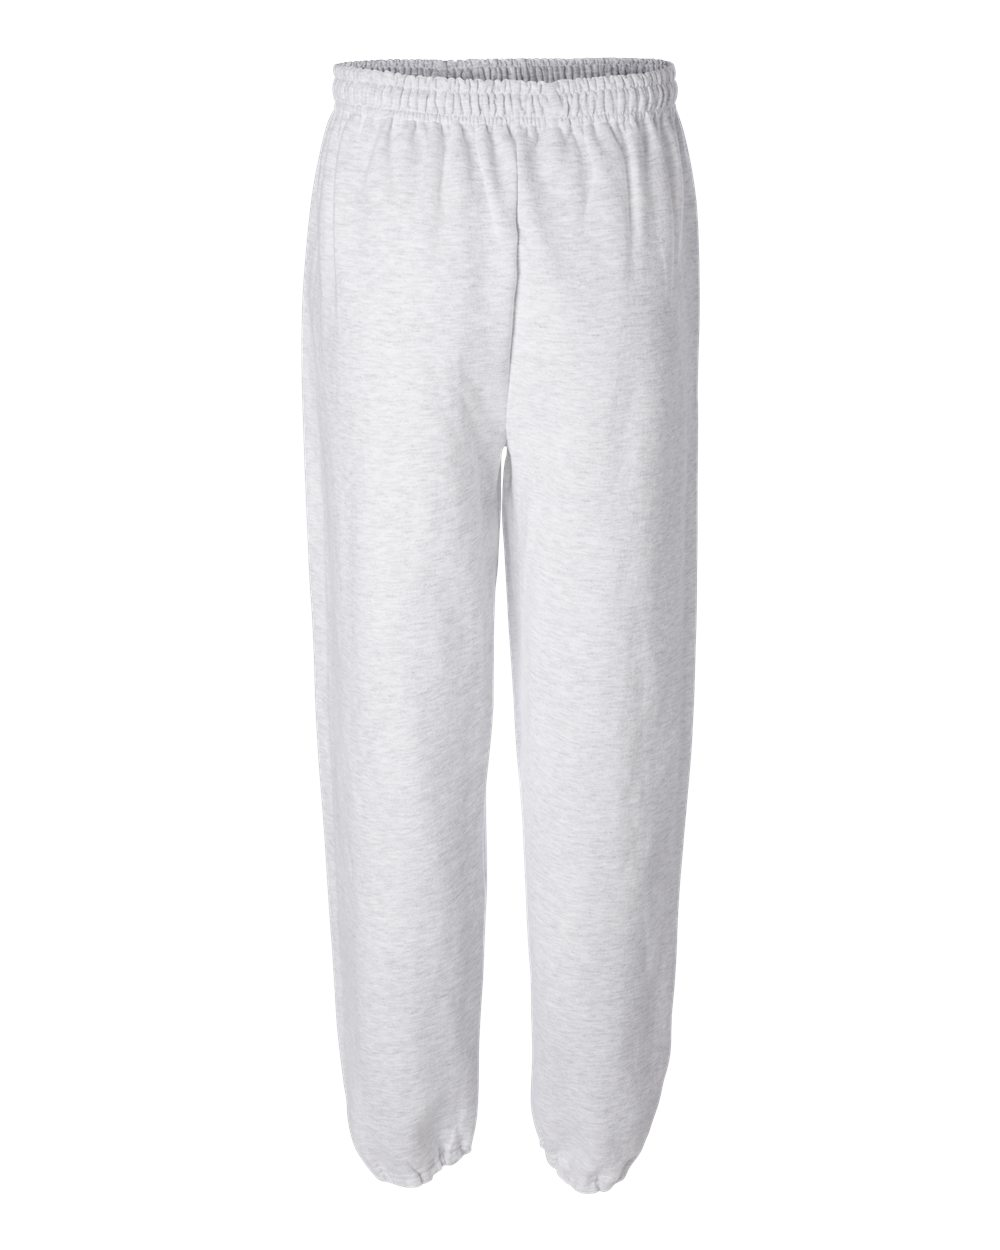 Gildan-Mens-Heavy-Blend-Sweatpants-18200-up-to-2XL thumbnail 7